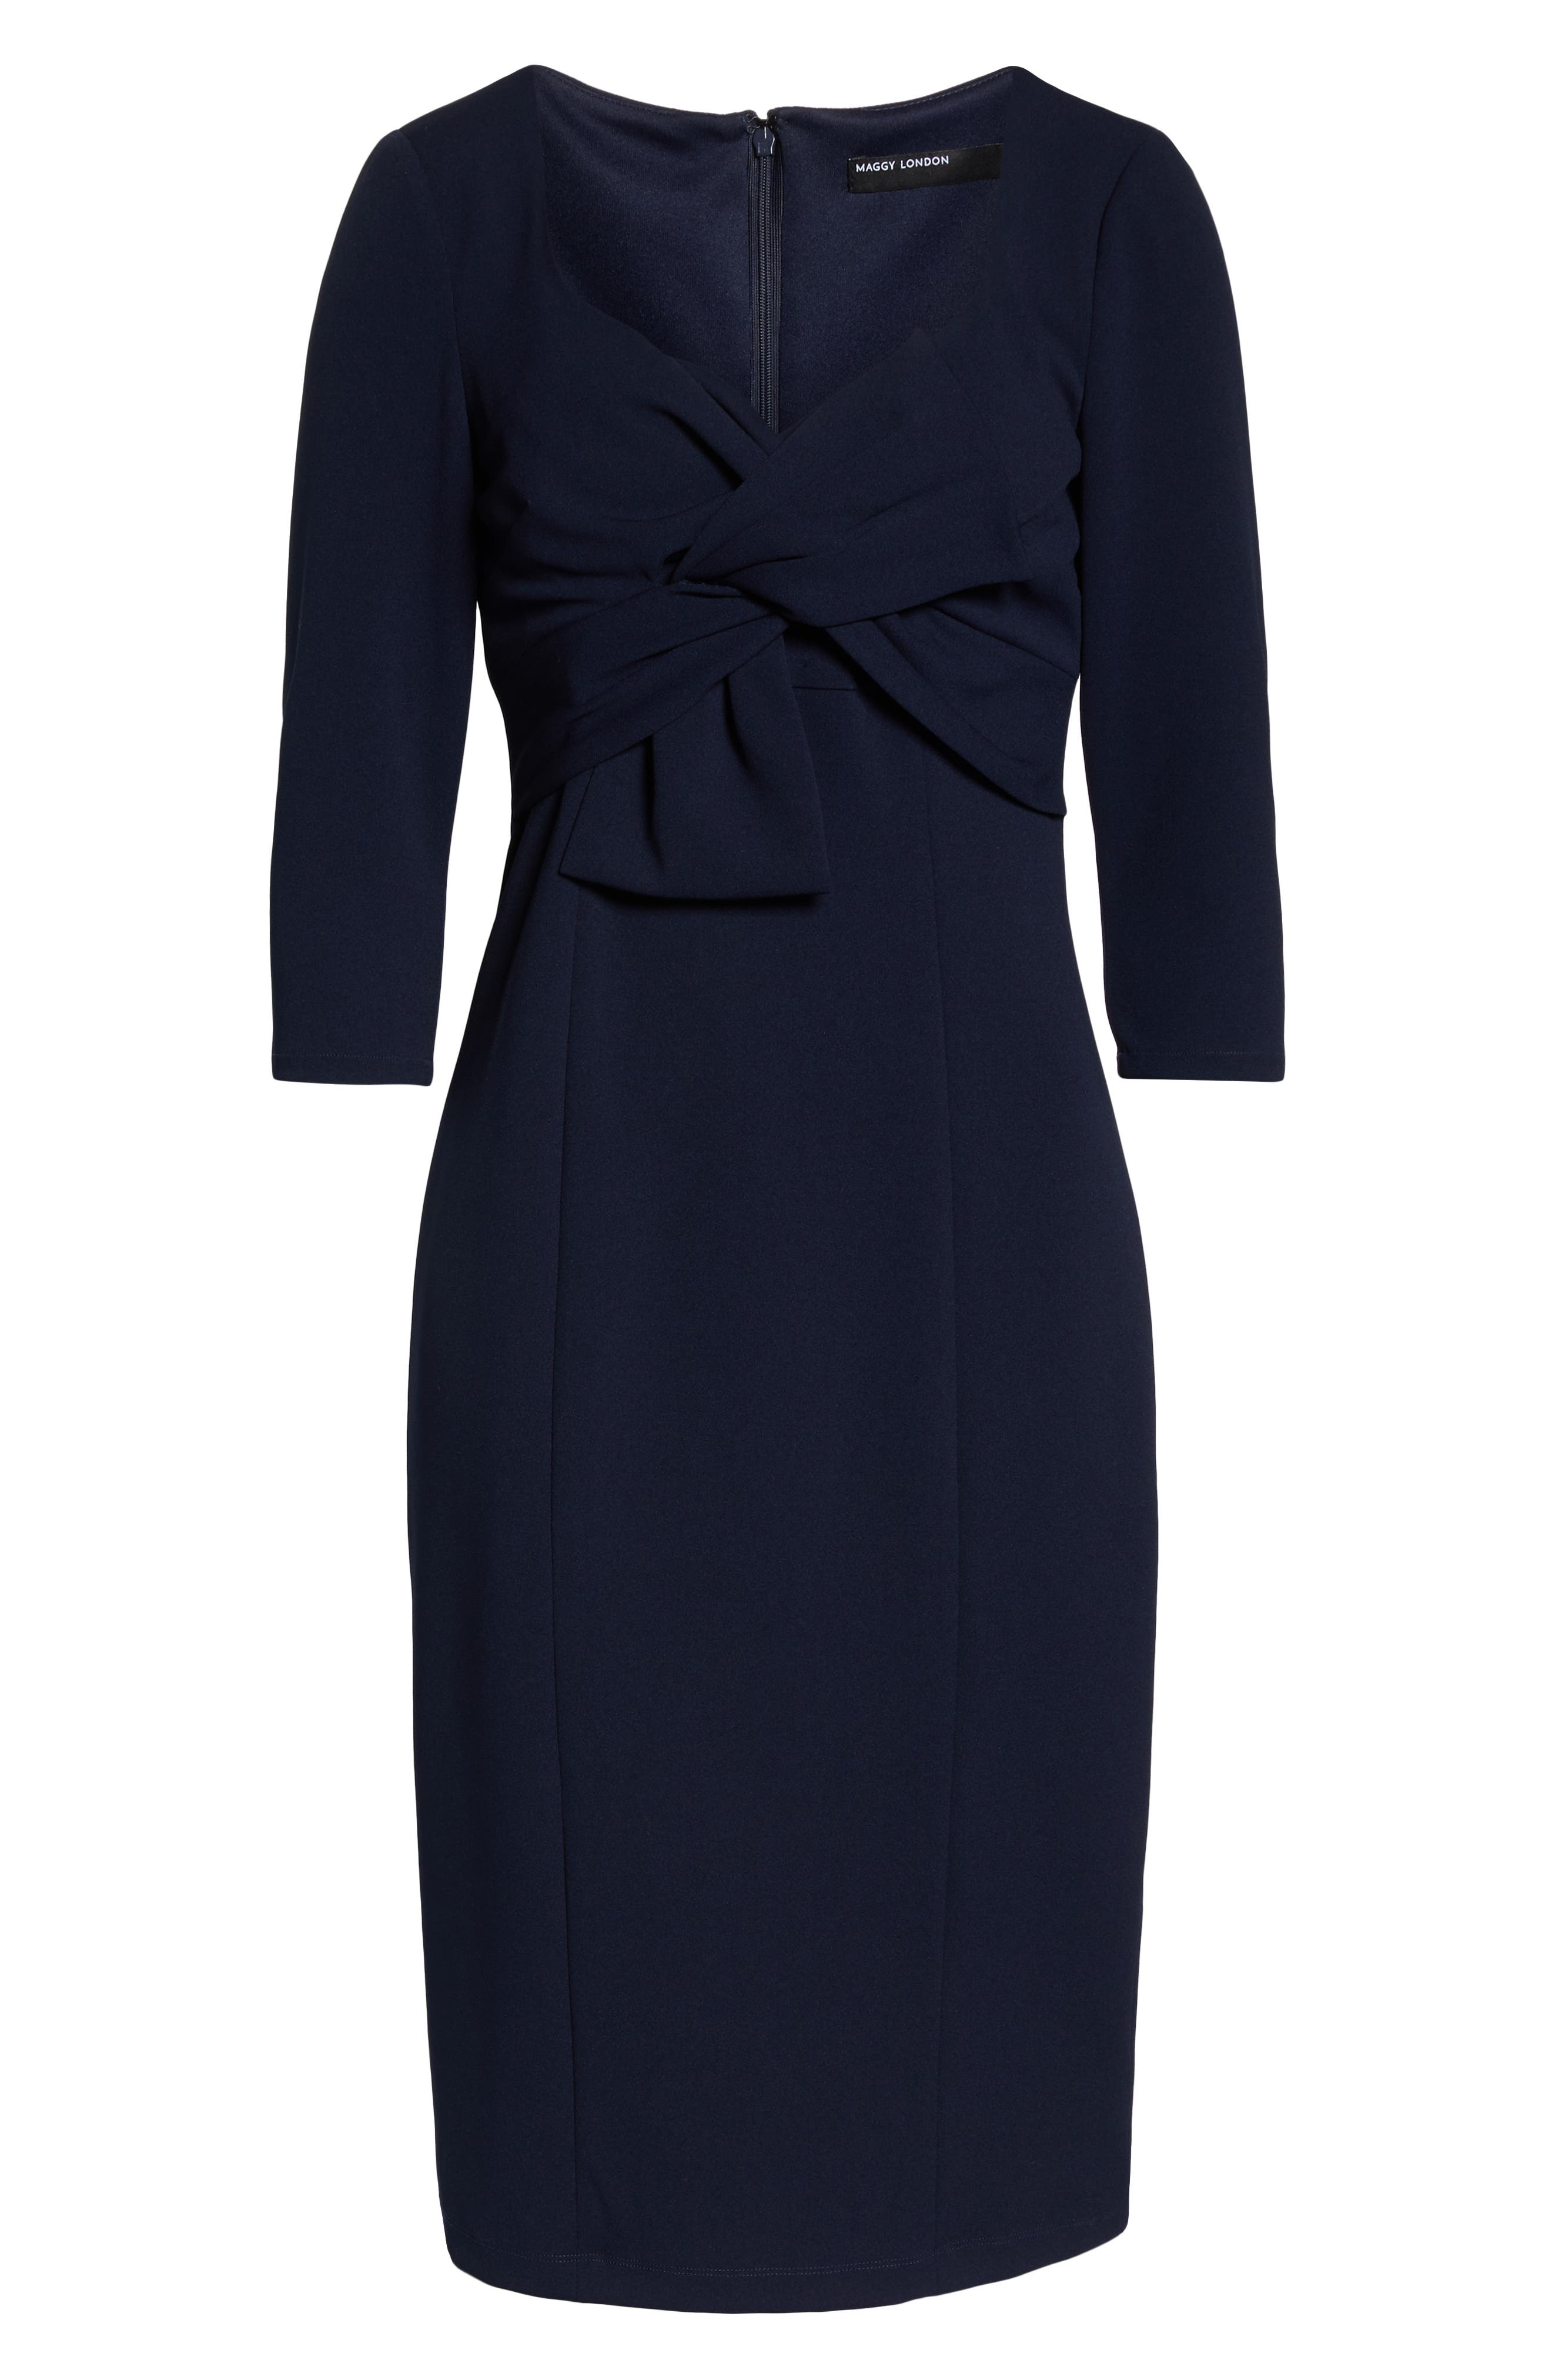 MAGGY LONDON,                             Bow Twist Scuba Crepe Dress,                             Alternate thumbnail 7, color,                             TWILIGHT NAVY